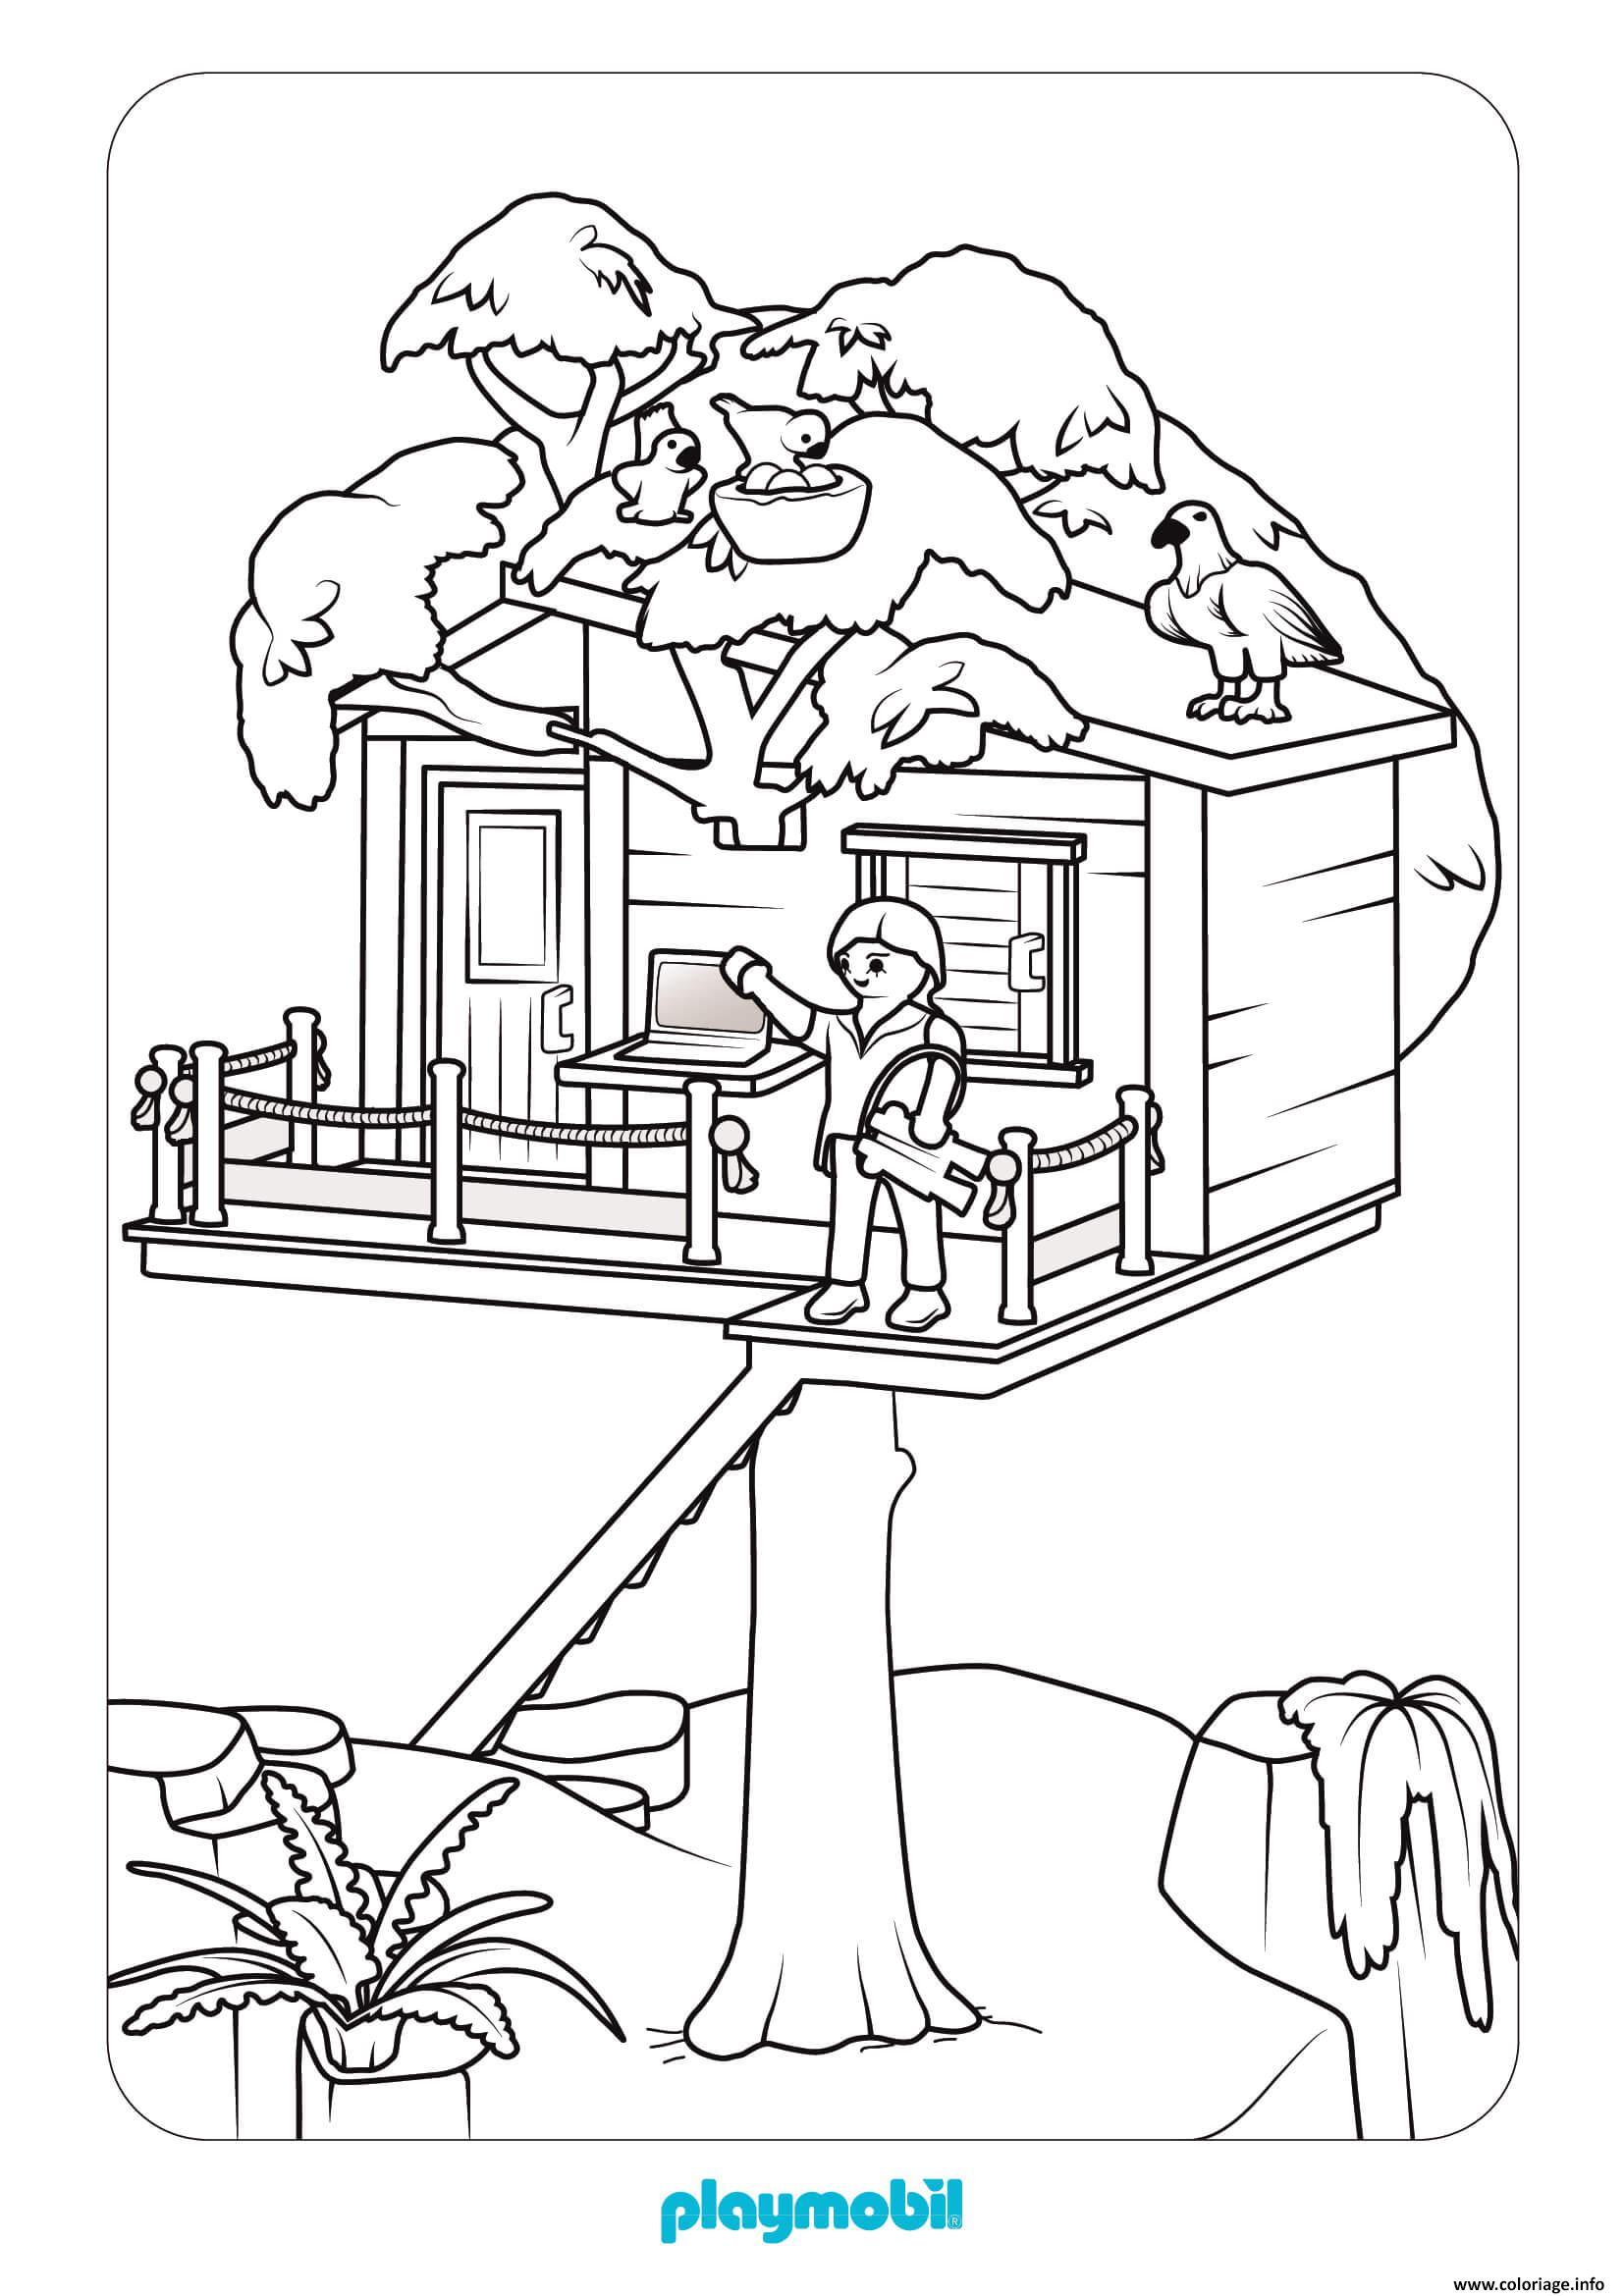 Coloriage Maison De Playmobil Dessin Playmobil A Imprimer